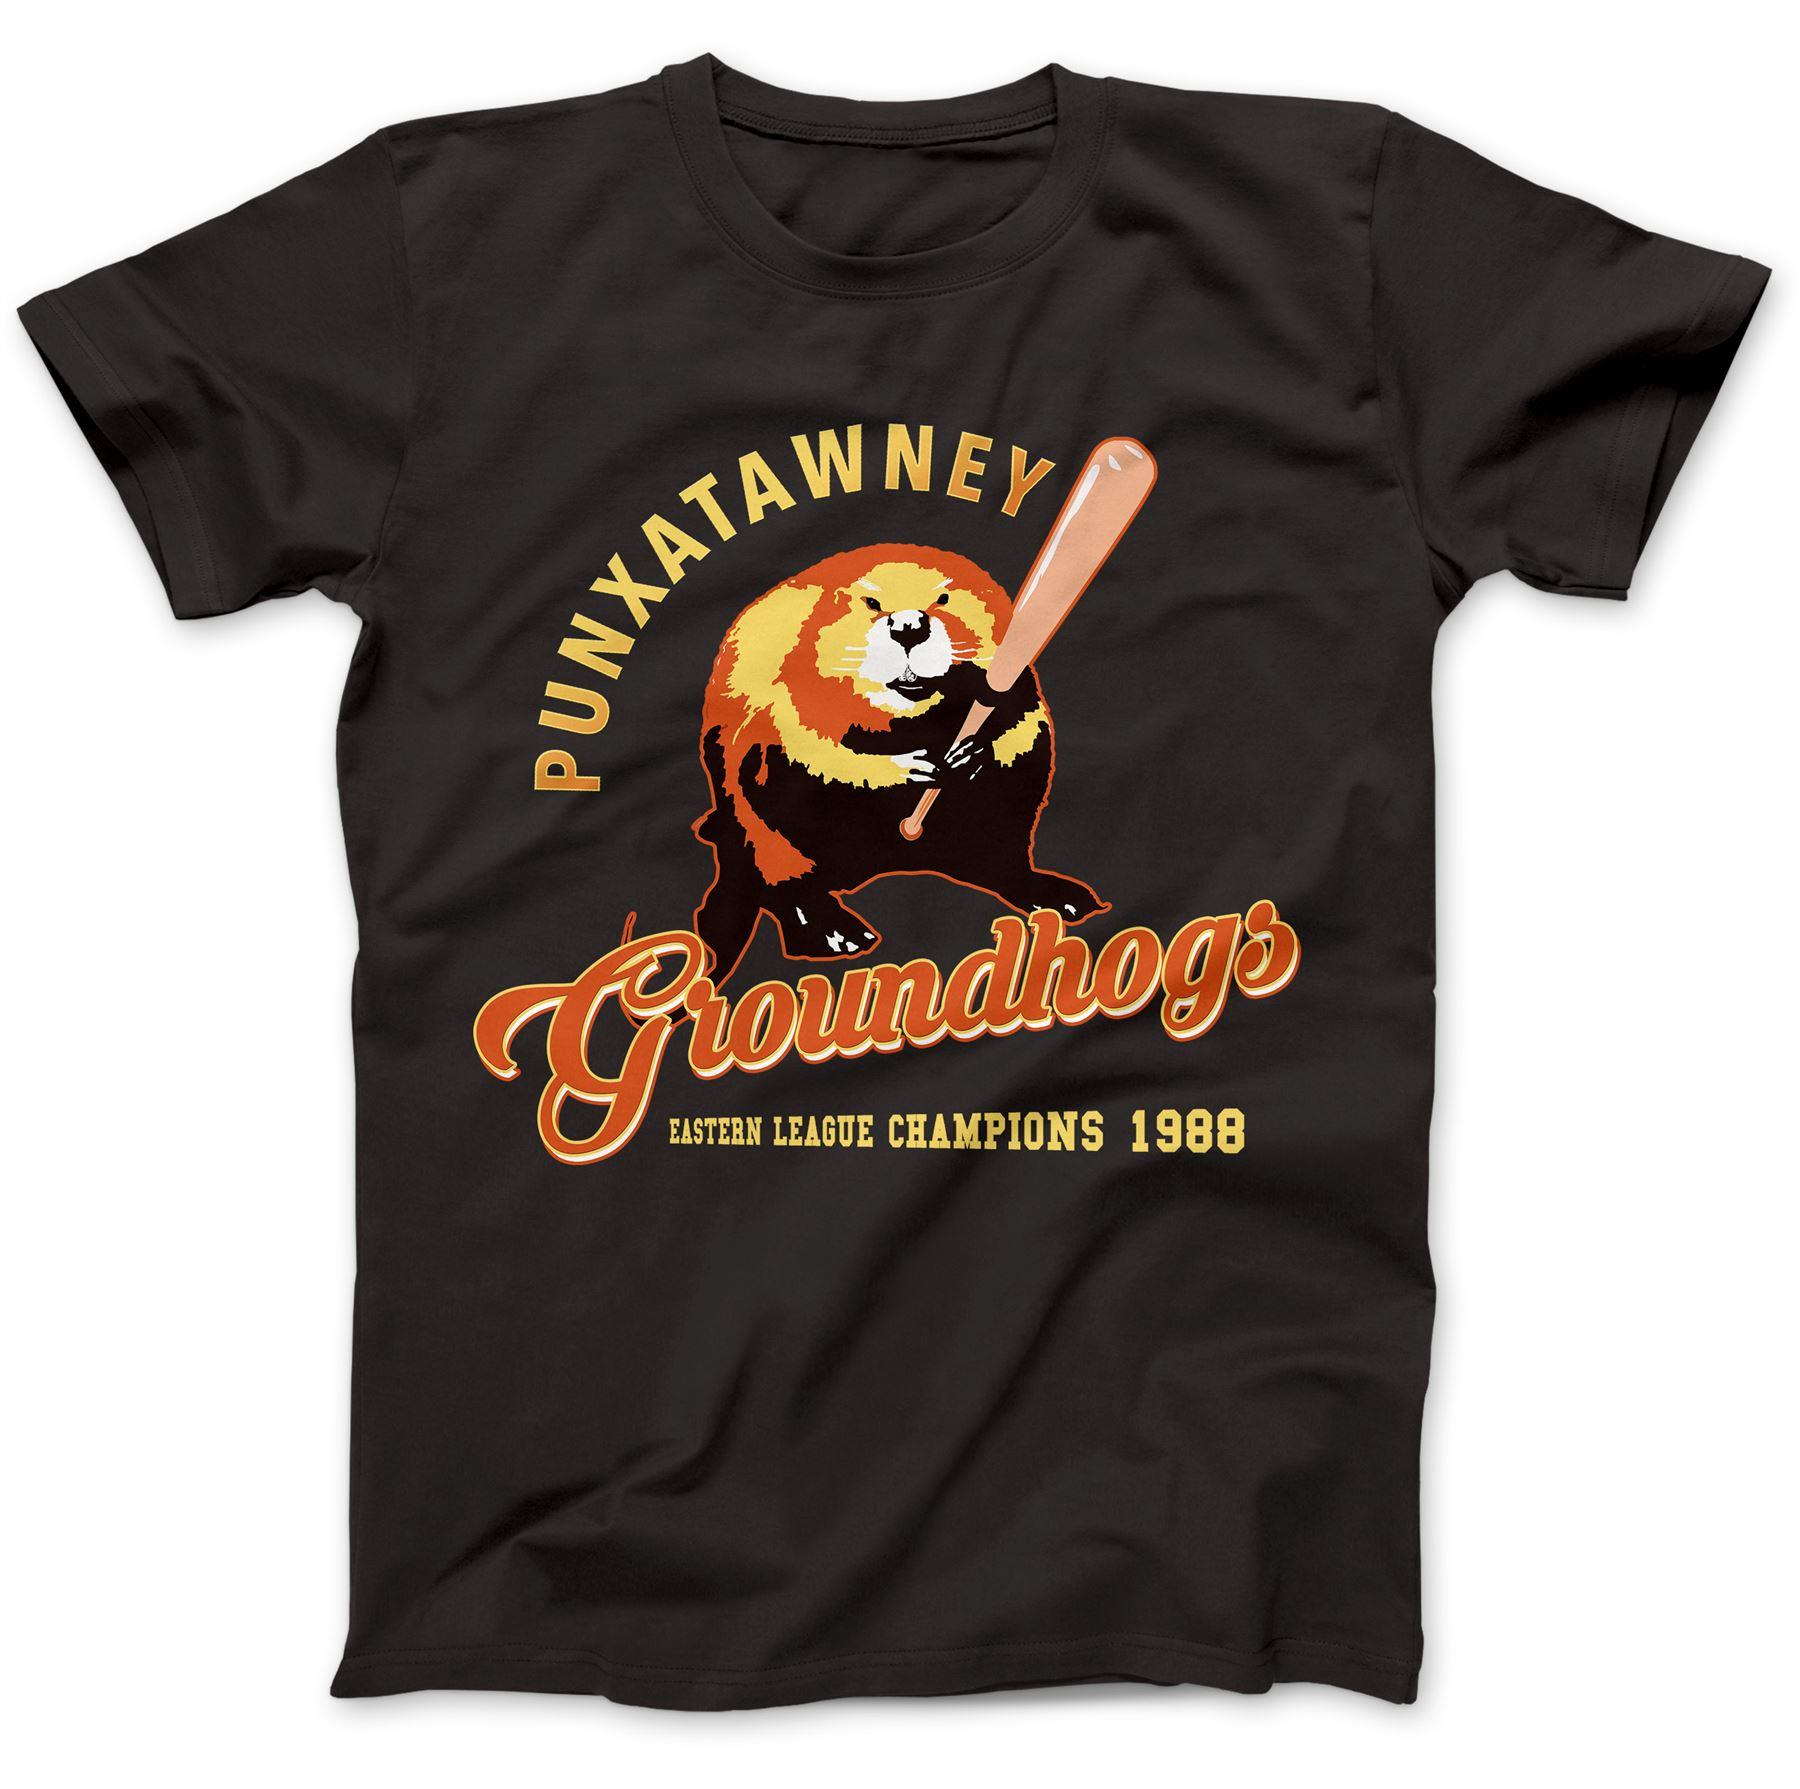 Groundhogs T-Shirt 100/% Premium Cotton Punxatwaney Groundhog Day